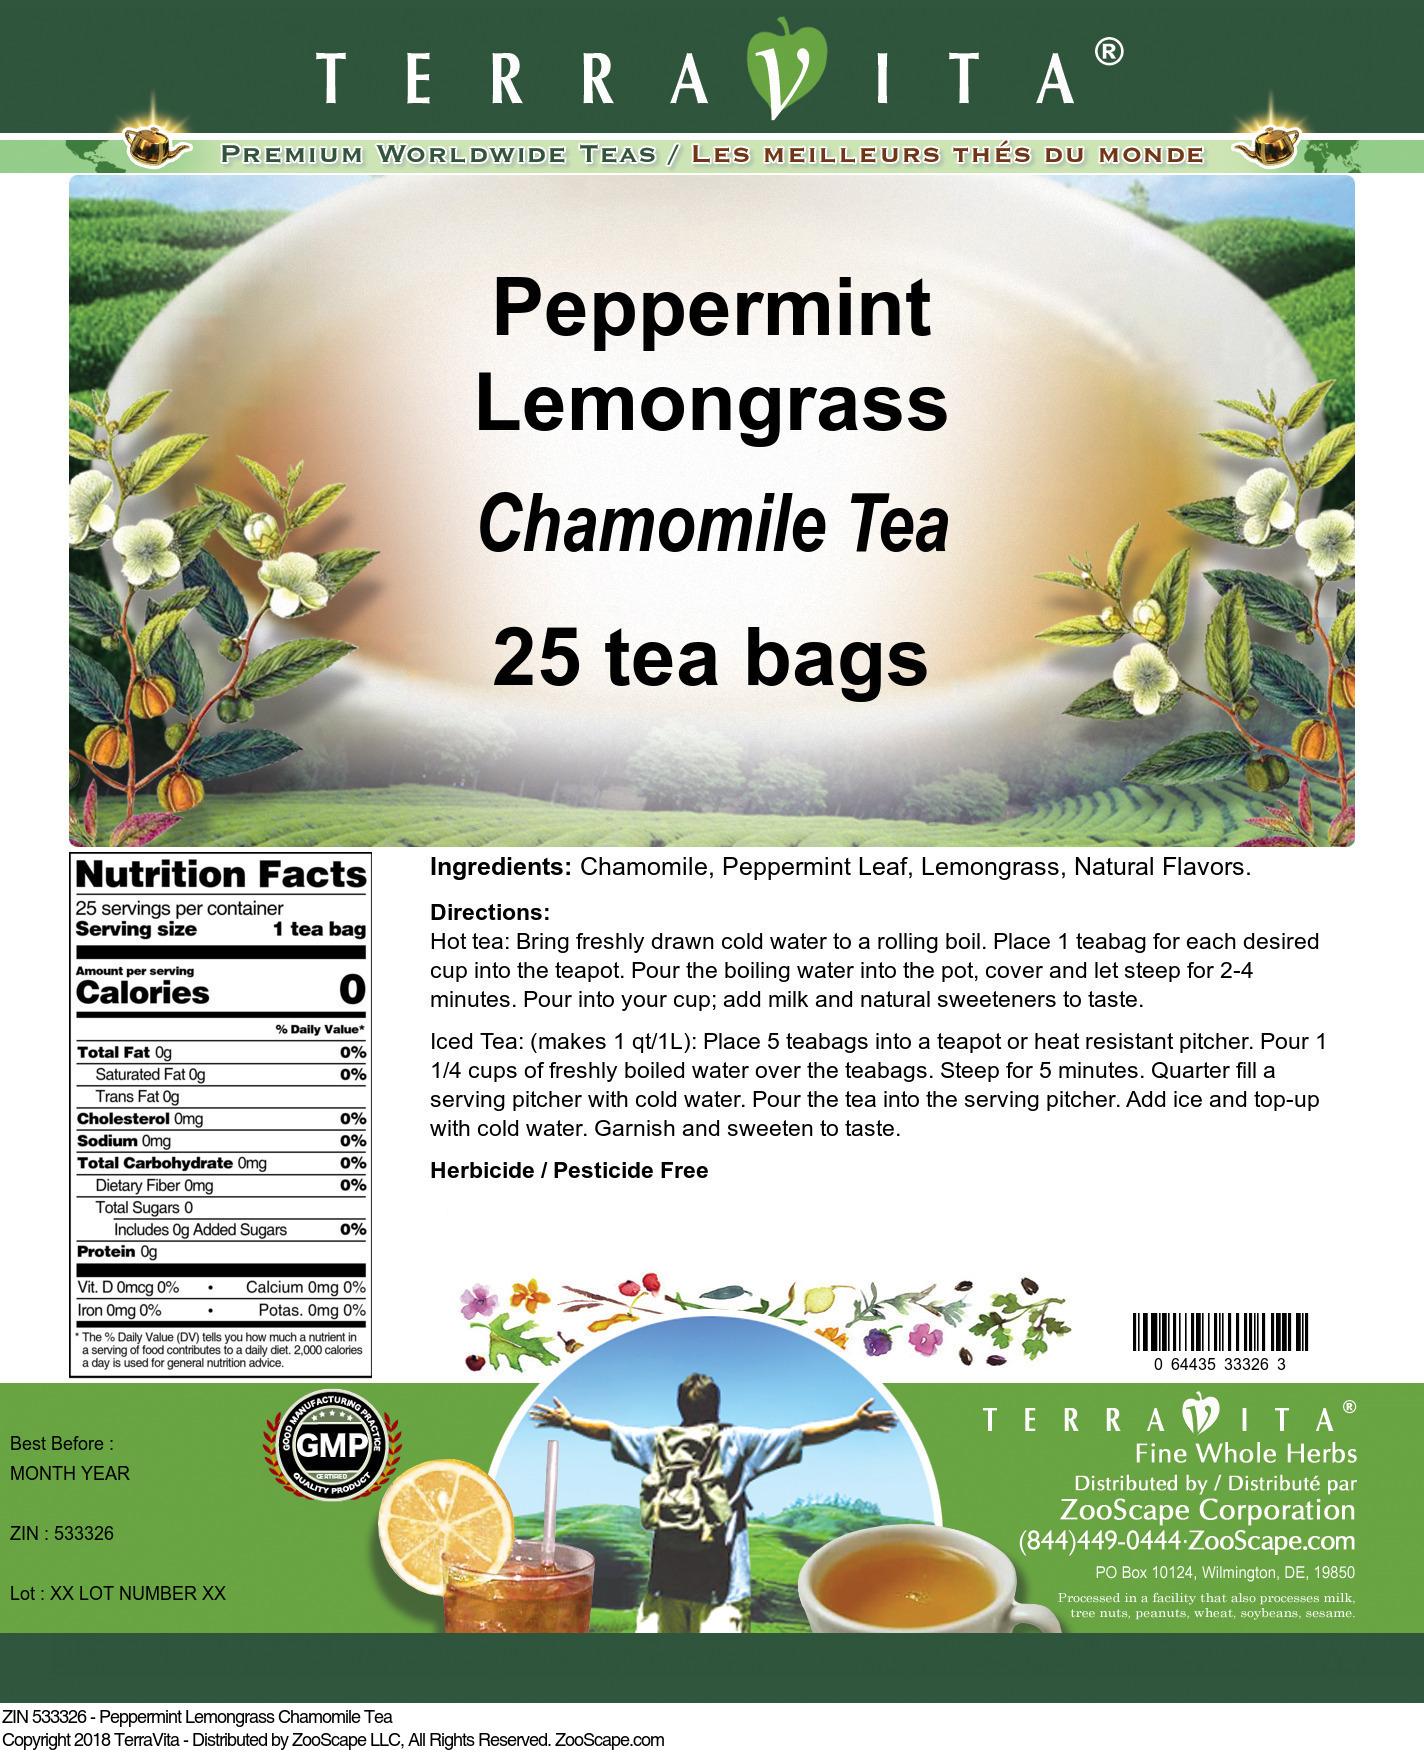 Peppermint Lemongrass Chamomile Tea